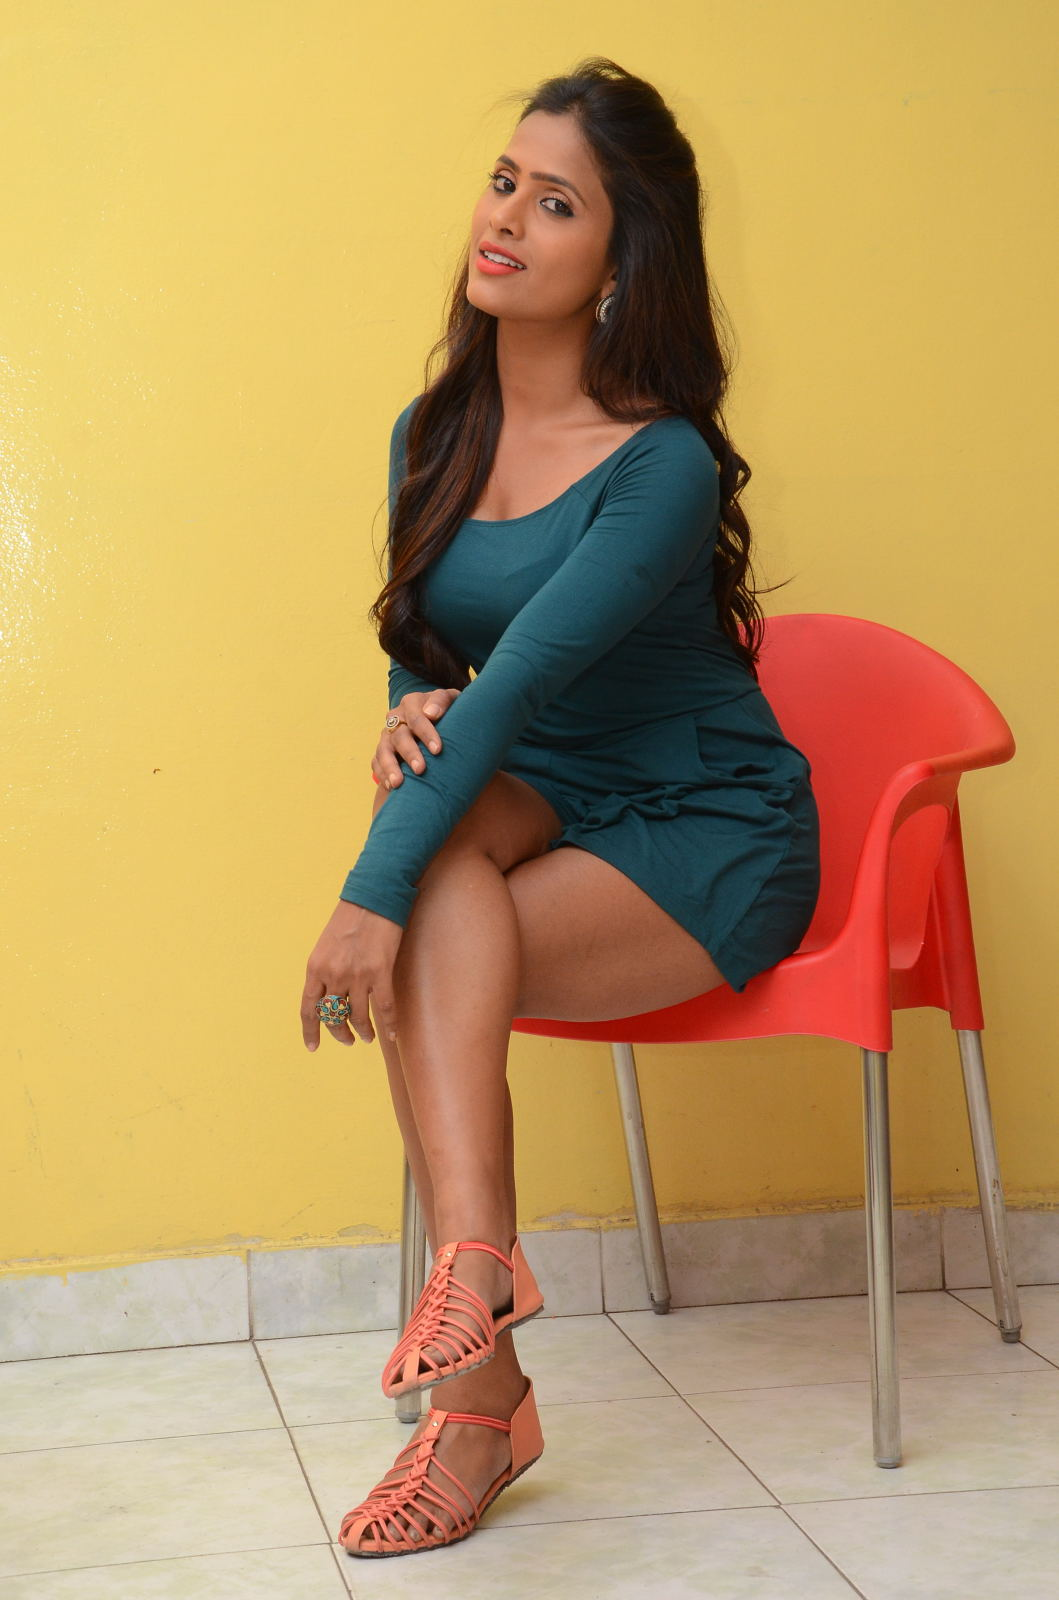 Super Hot Prashanthi In Sexy Outfit  Indian Cinema  Models  Actress-8268